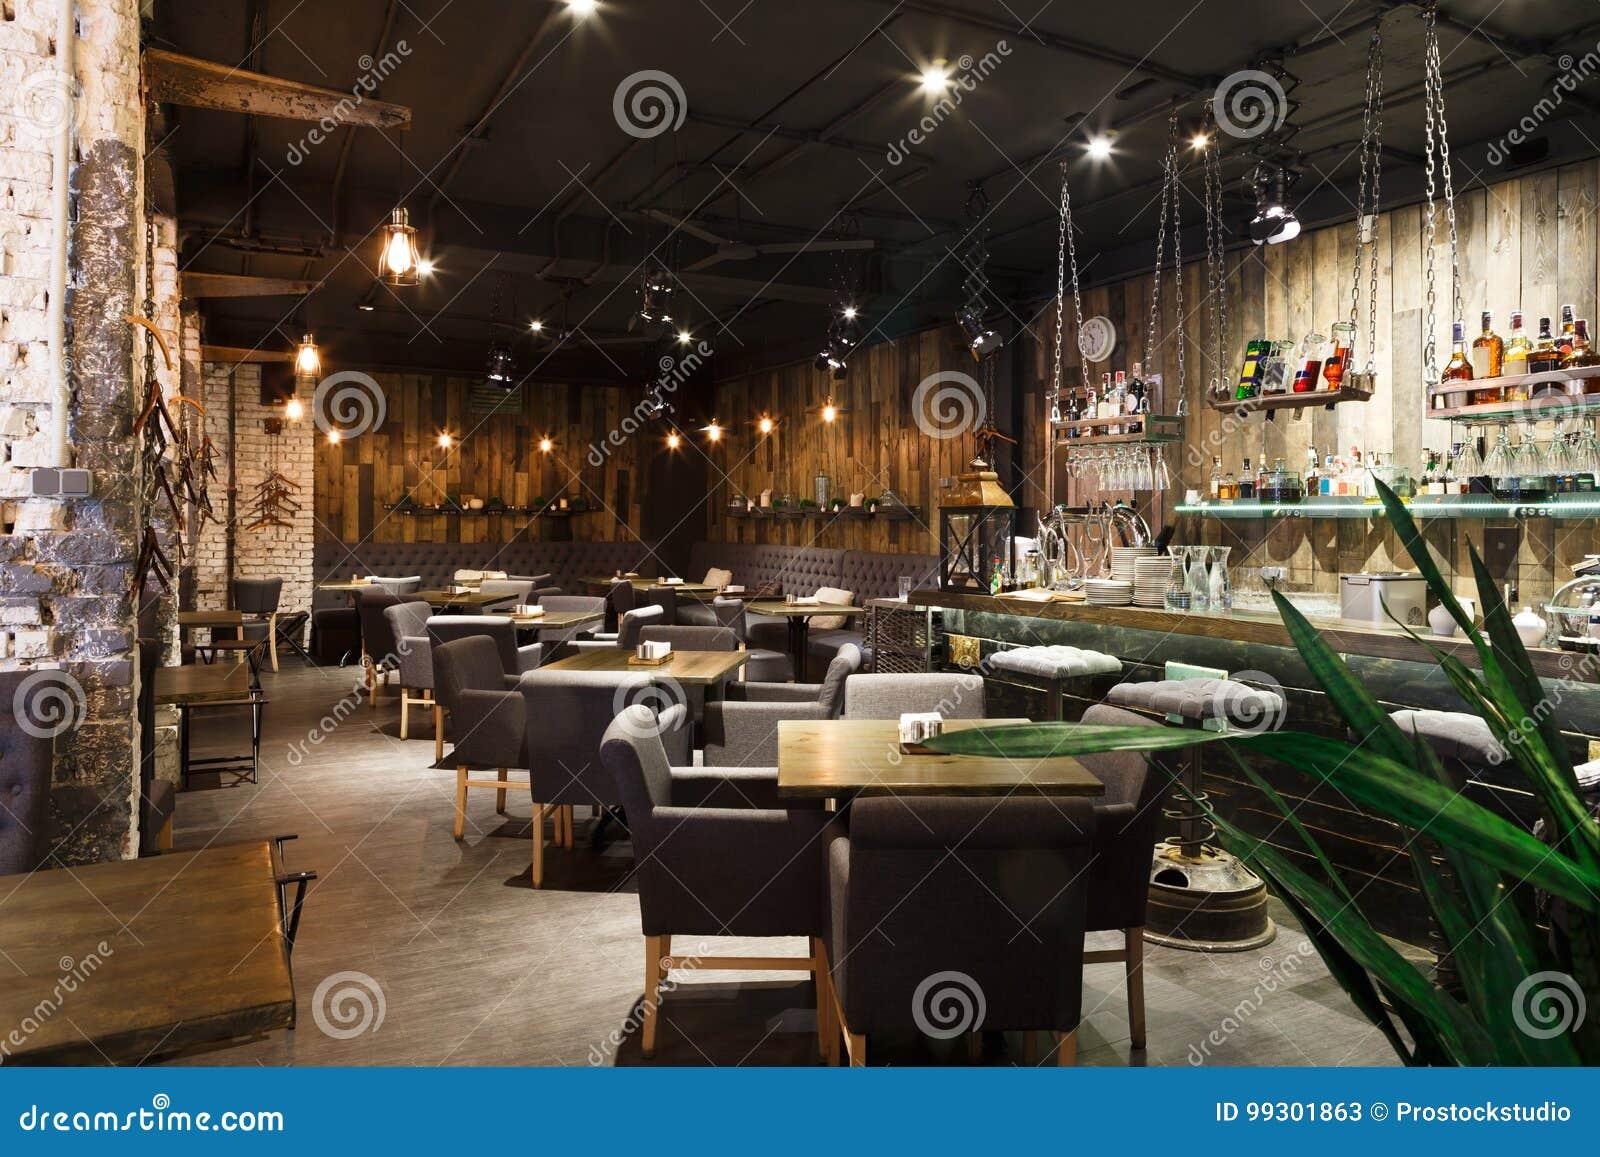 Innenraum des gemütlichen Restaurants, Dachbodenart